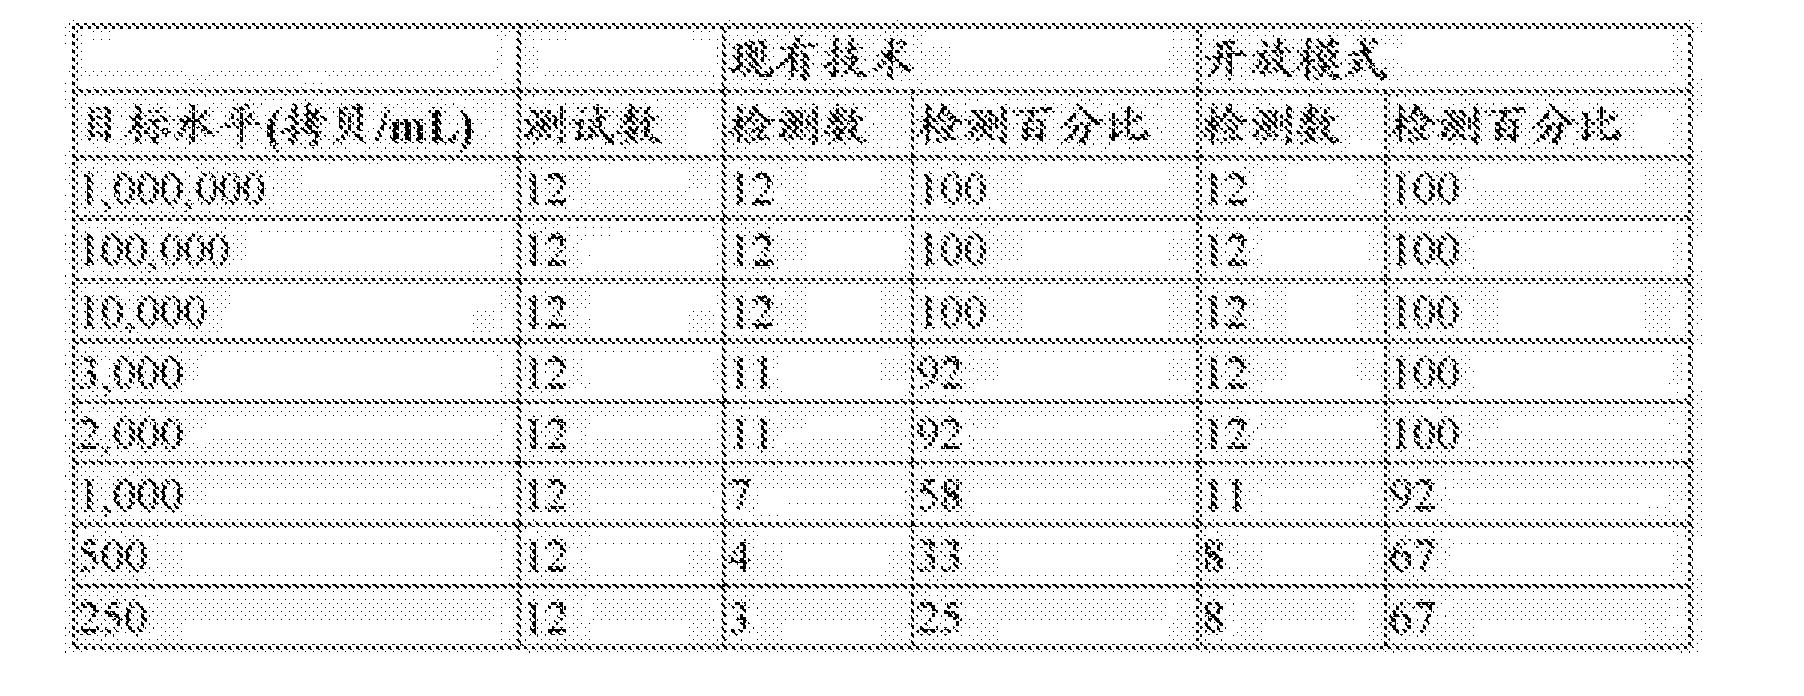 Figure CN106716140AD00182